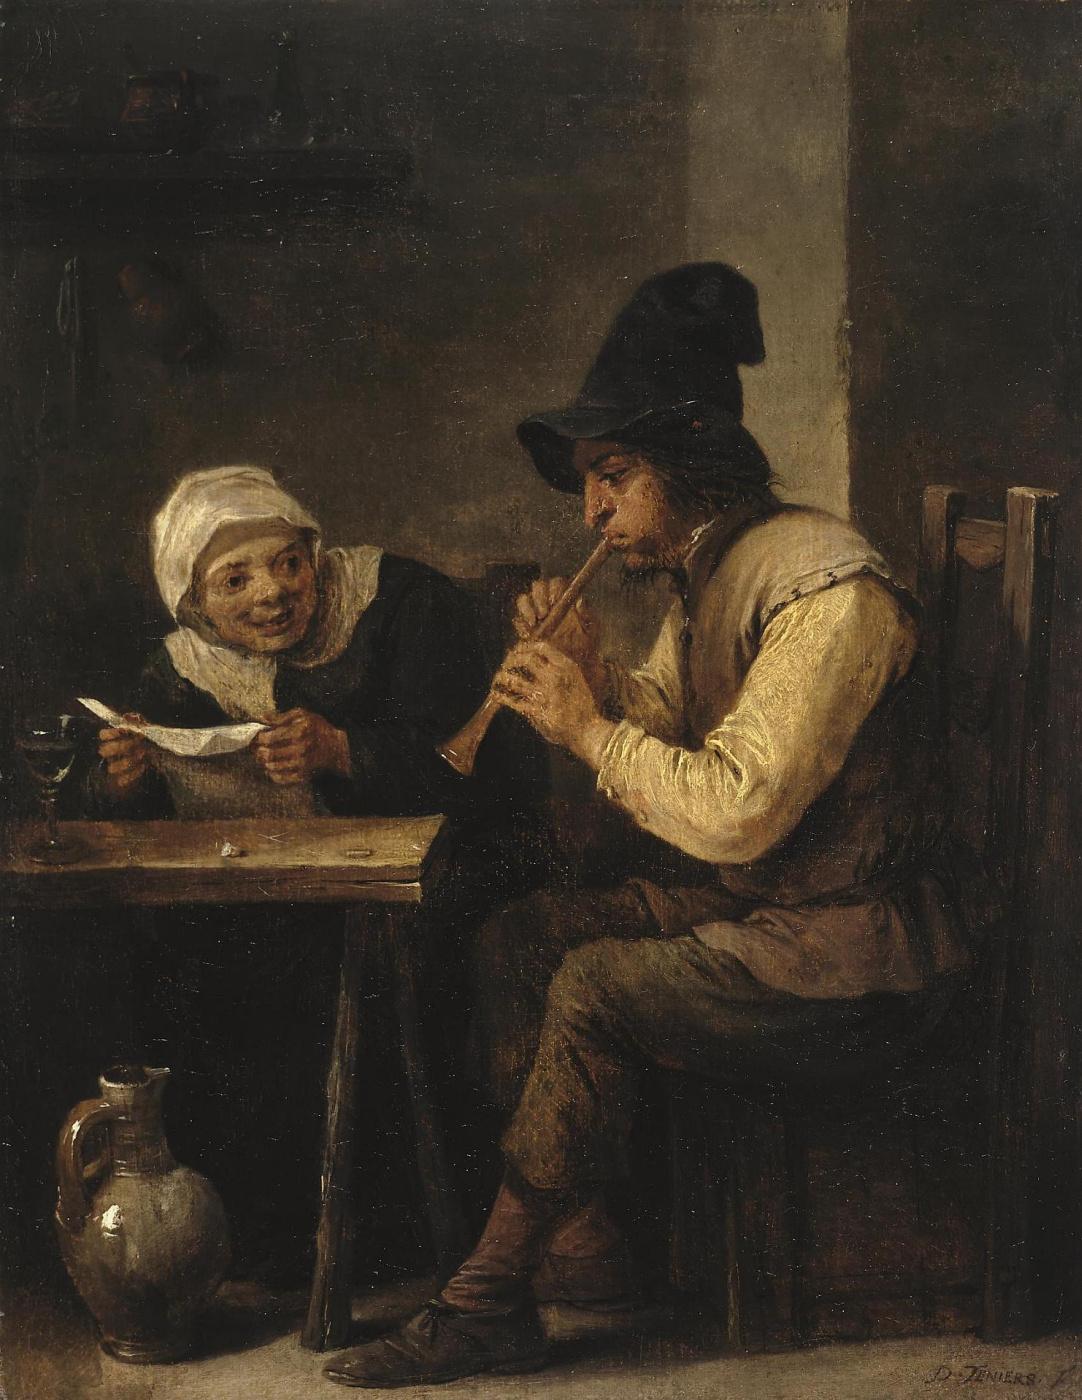 David Teniers the Younger. Duet